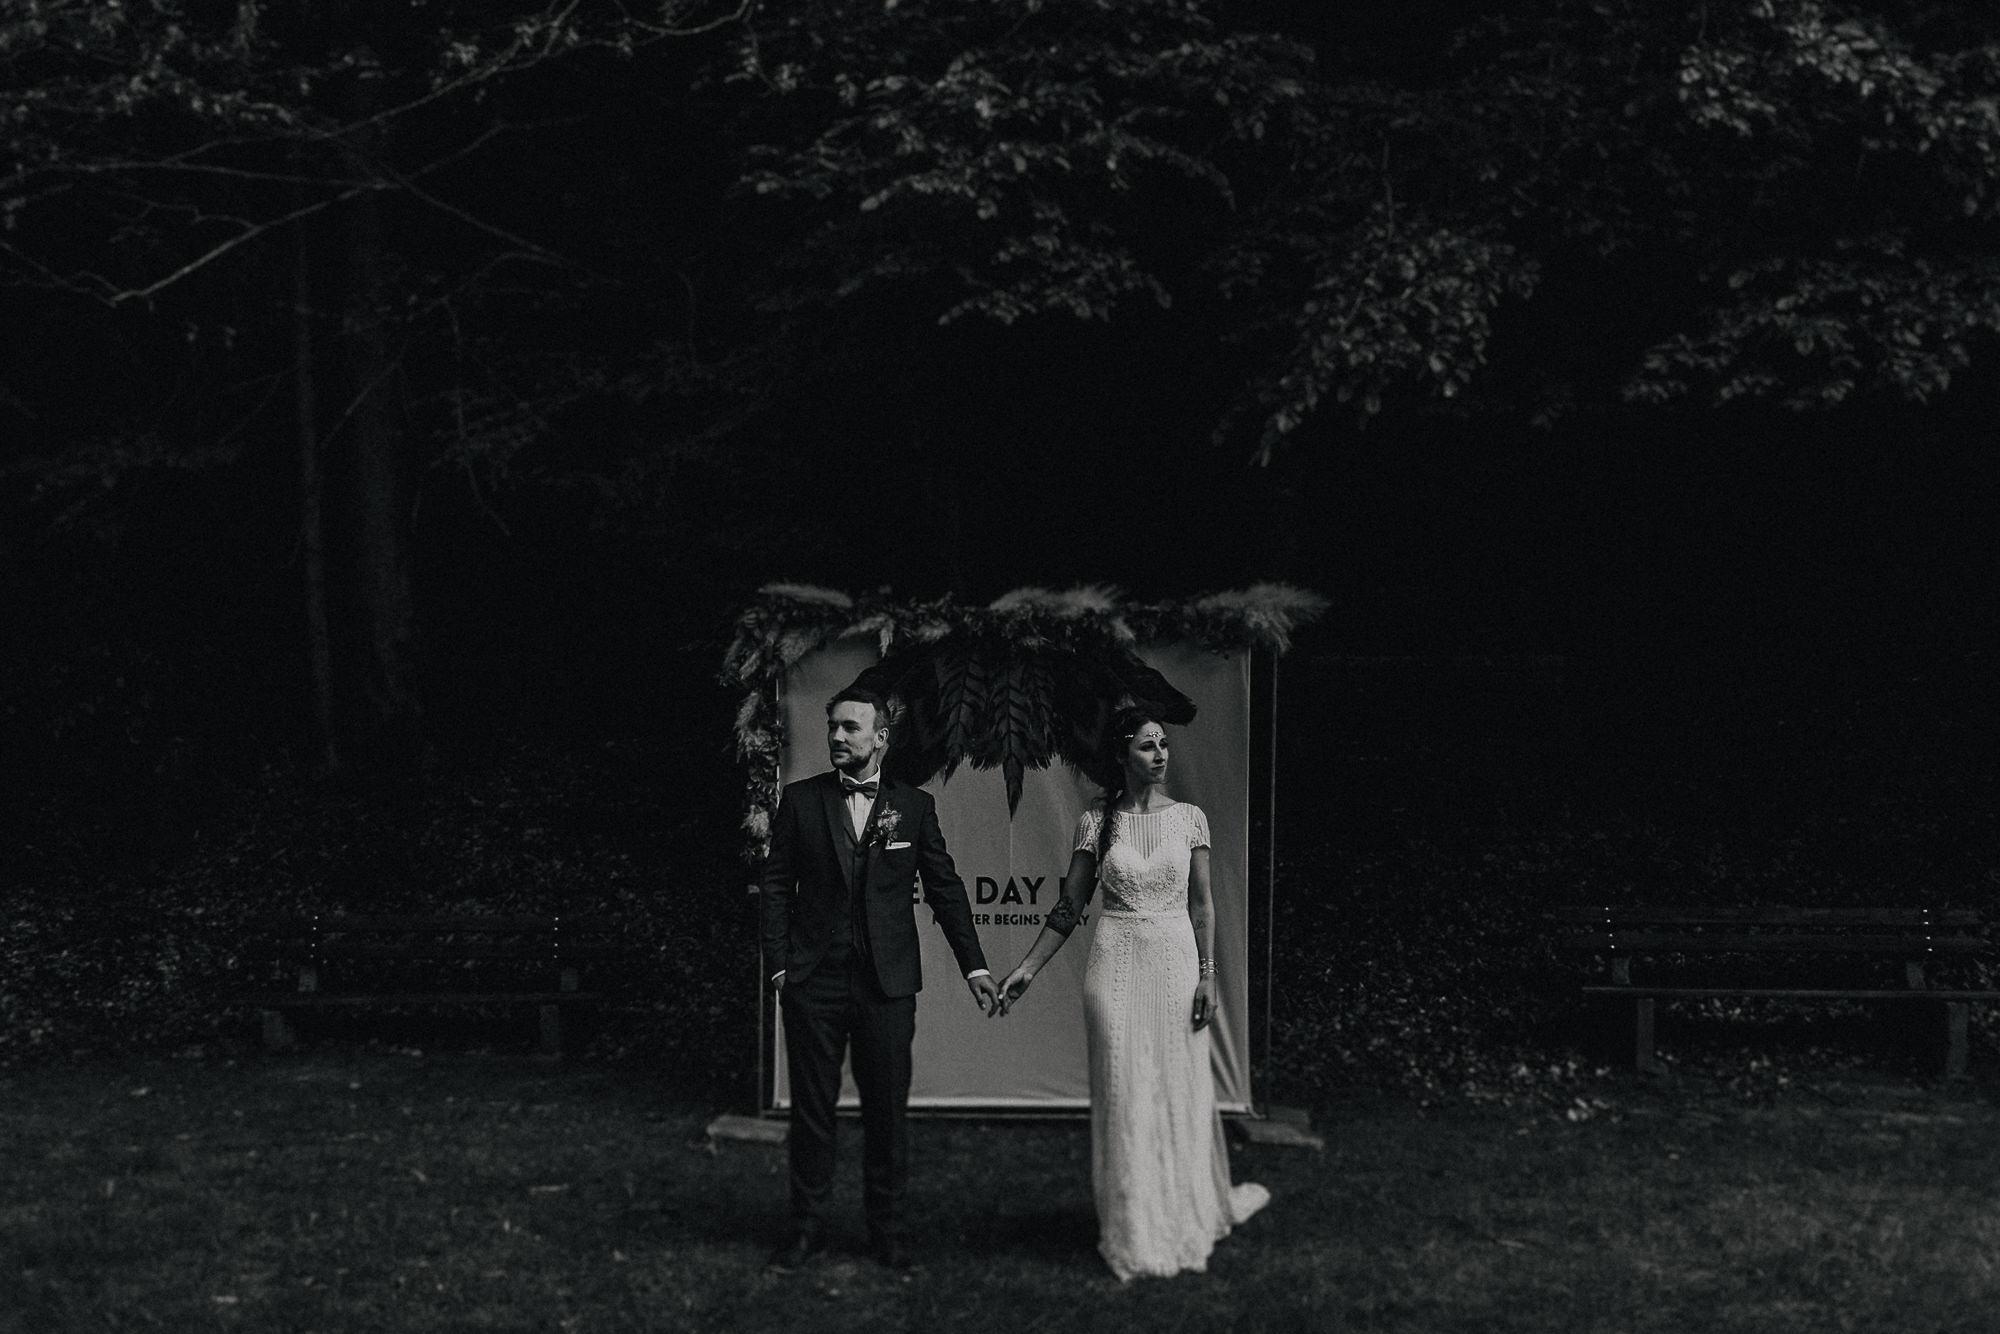 Hochzeitsfotograf-Potsdam-Tom-und-Lia-Fotografie-5DT_0468